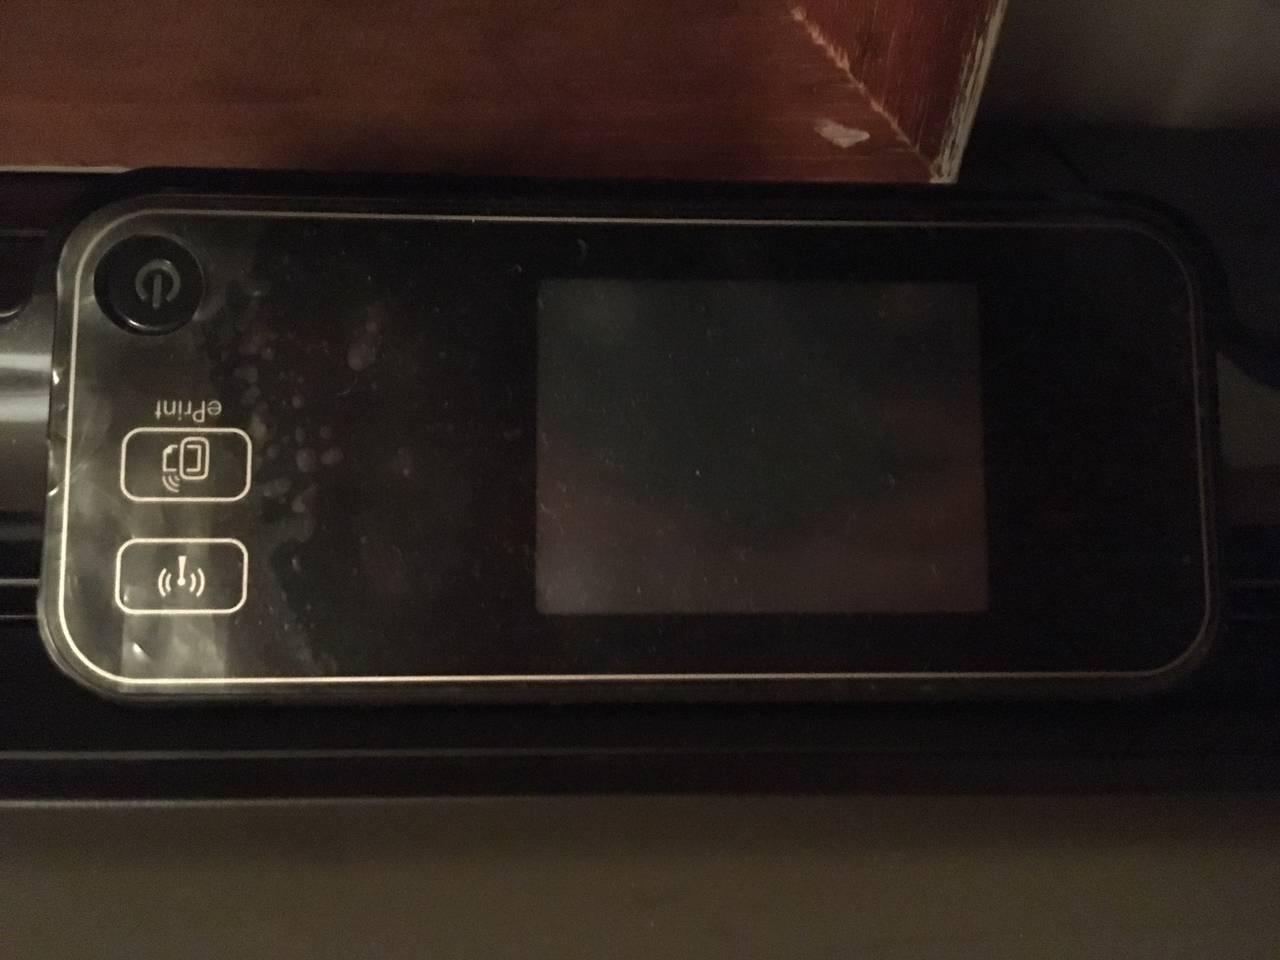 2 IMPRESORAS: Impresora HP e impresora-scanner HP